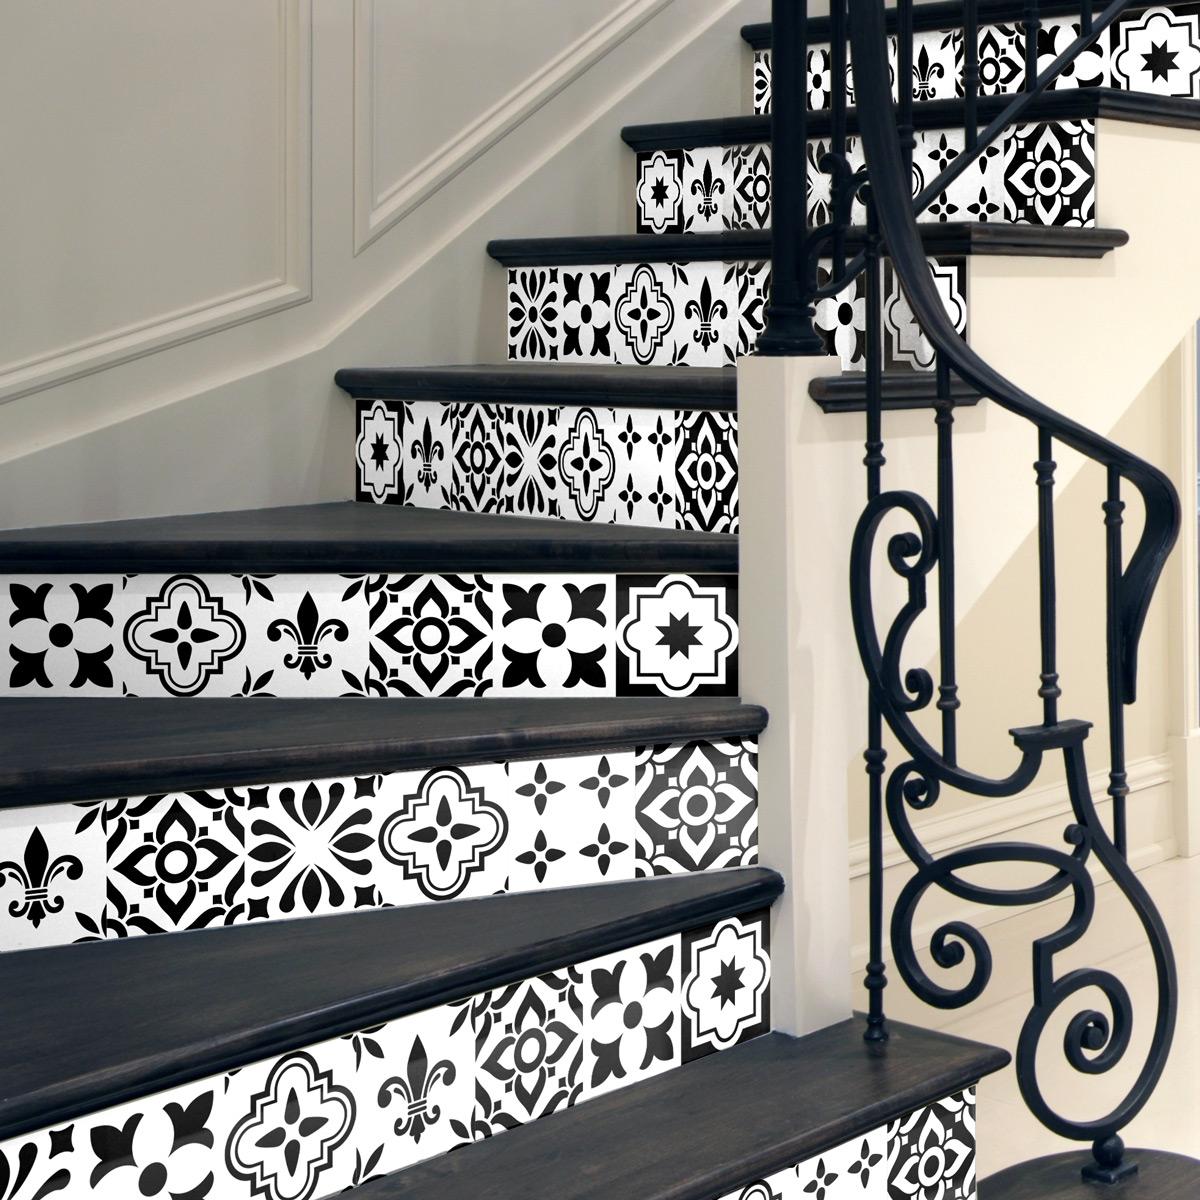 stickers contremarche carreaux de ciment damiano x 2 stickers promos stickers 50. Black Bedroom Furniture Sets. Home Design Ideas